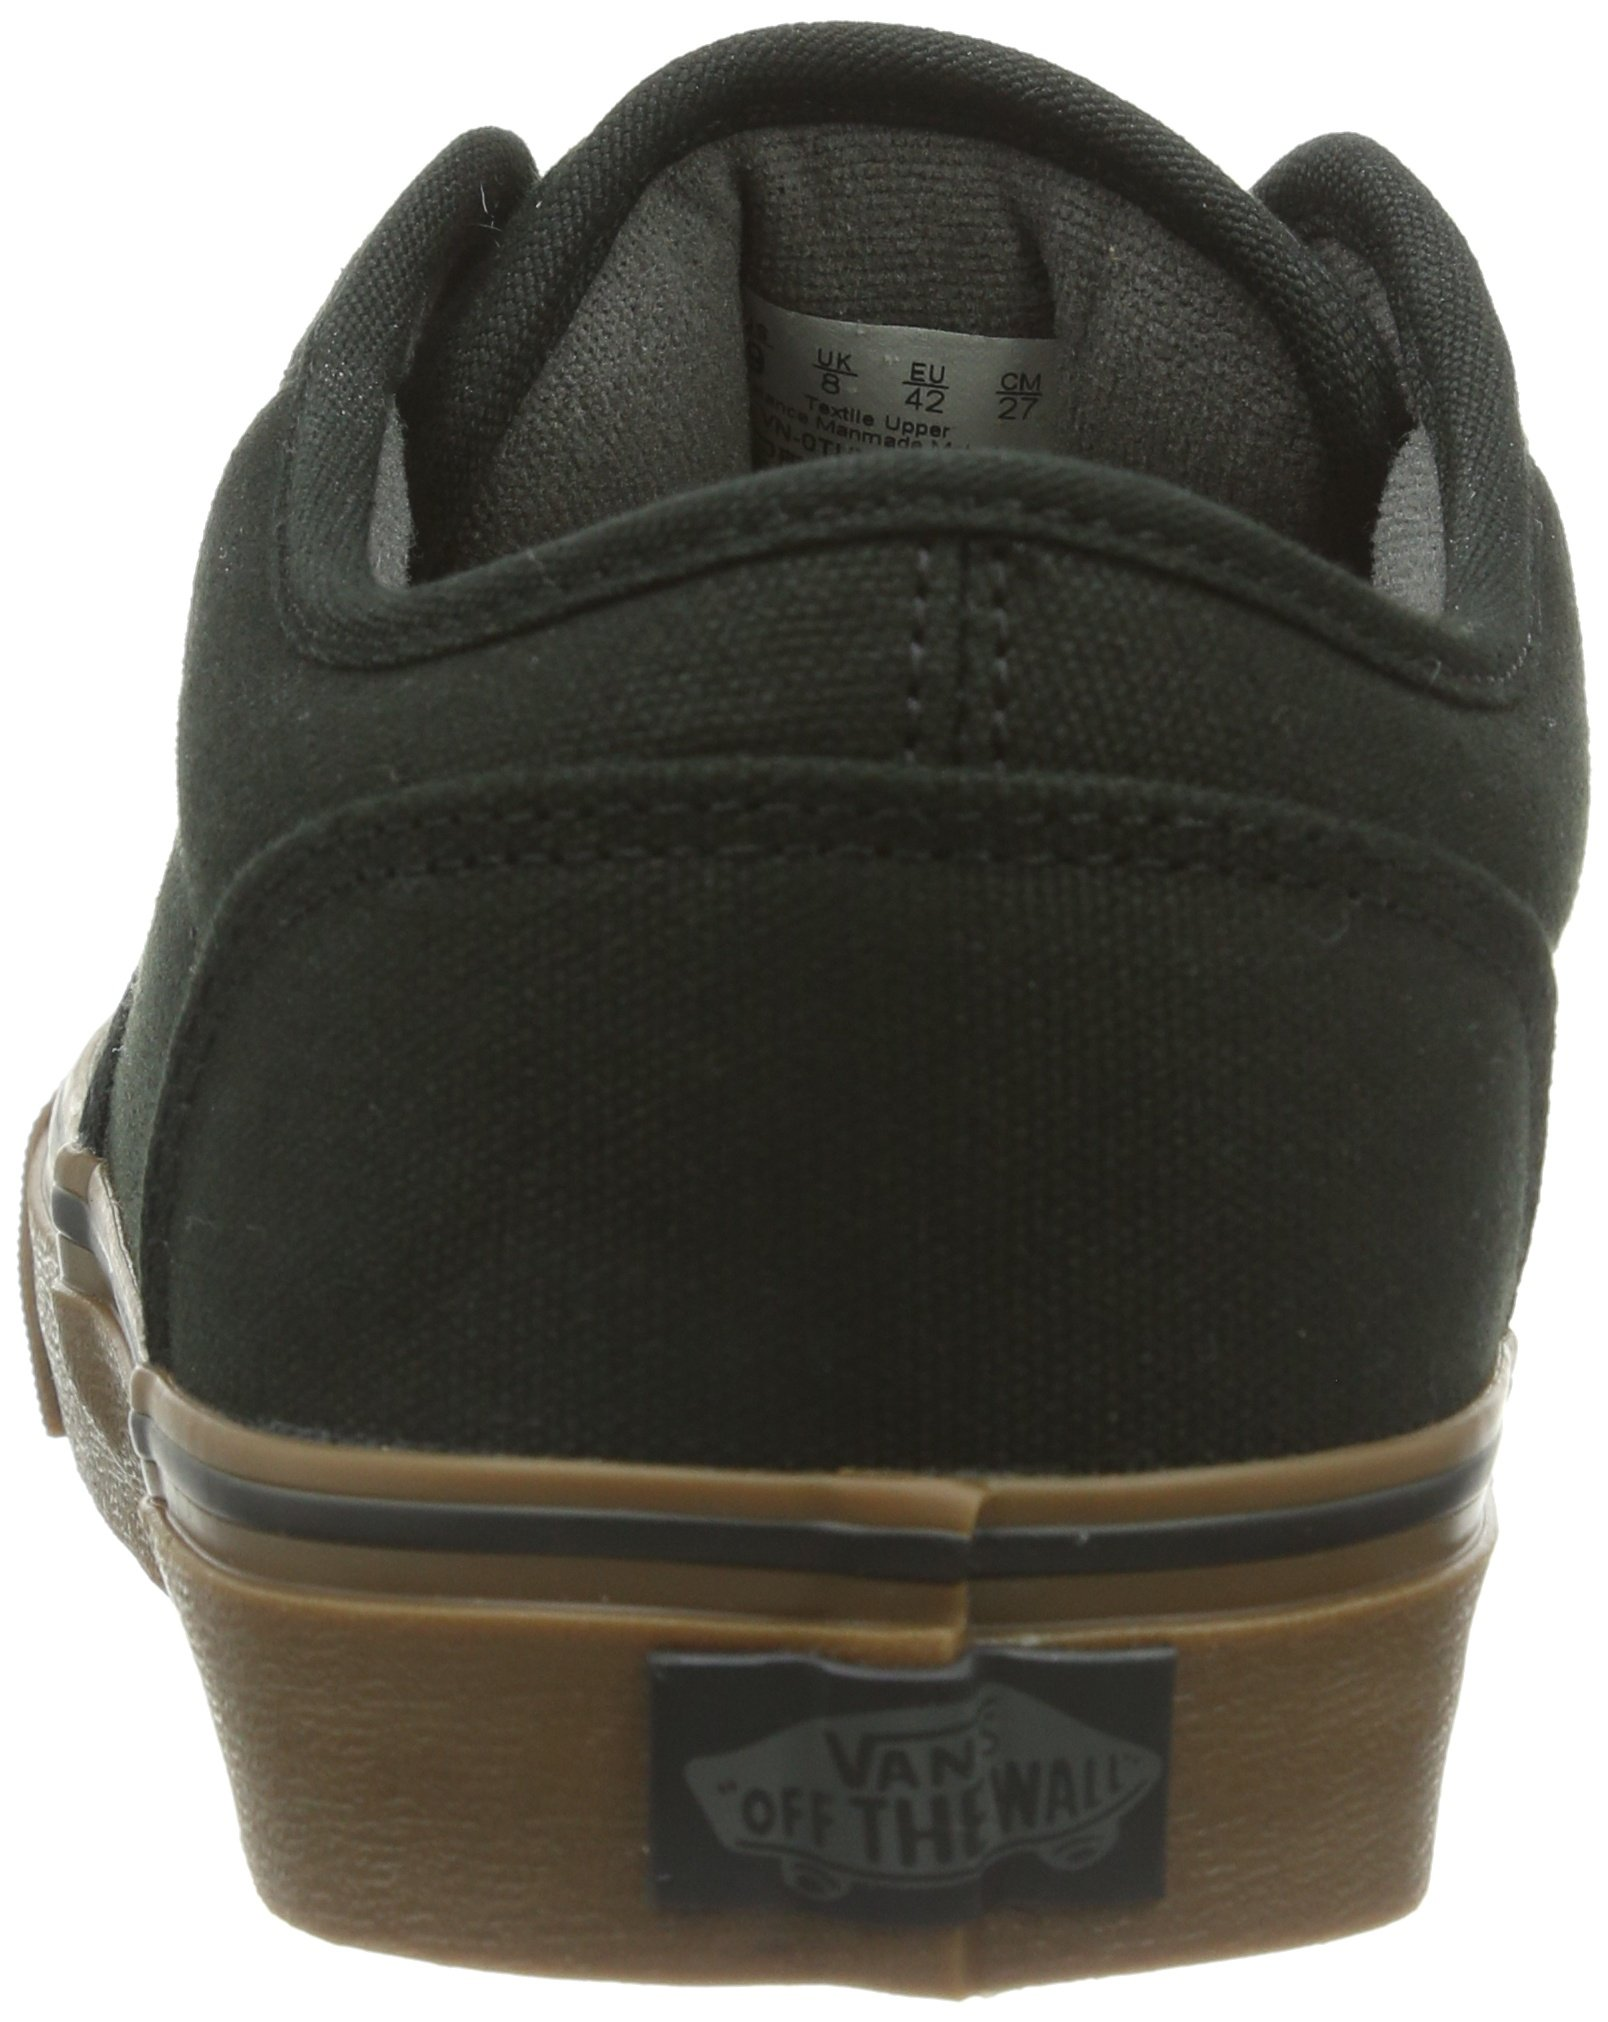 7c537ebac1956 Vans Men s Atwood (12 oz Canvas) Black Gum Skate Shoe 10 Men US - VTUYD8E    Fashion Sneakers   Clothing